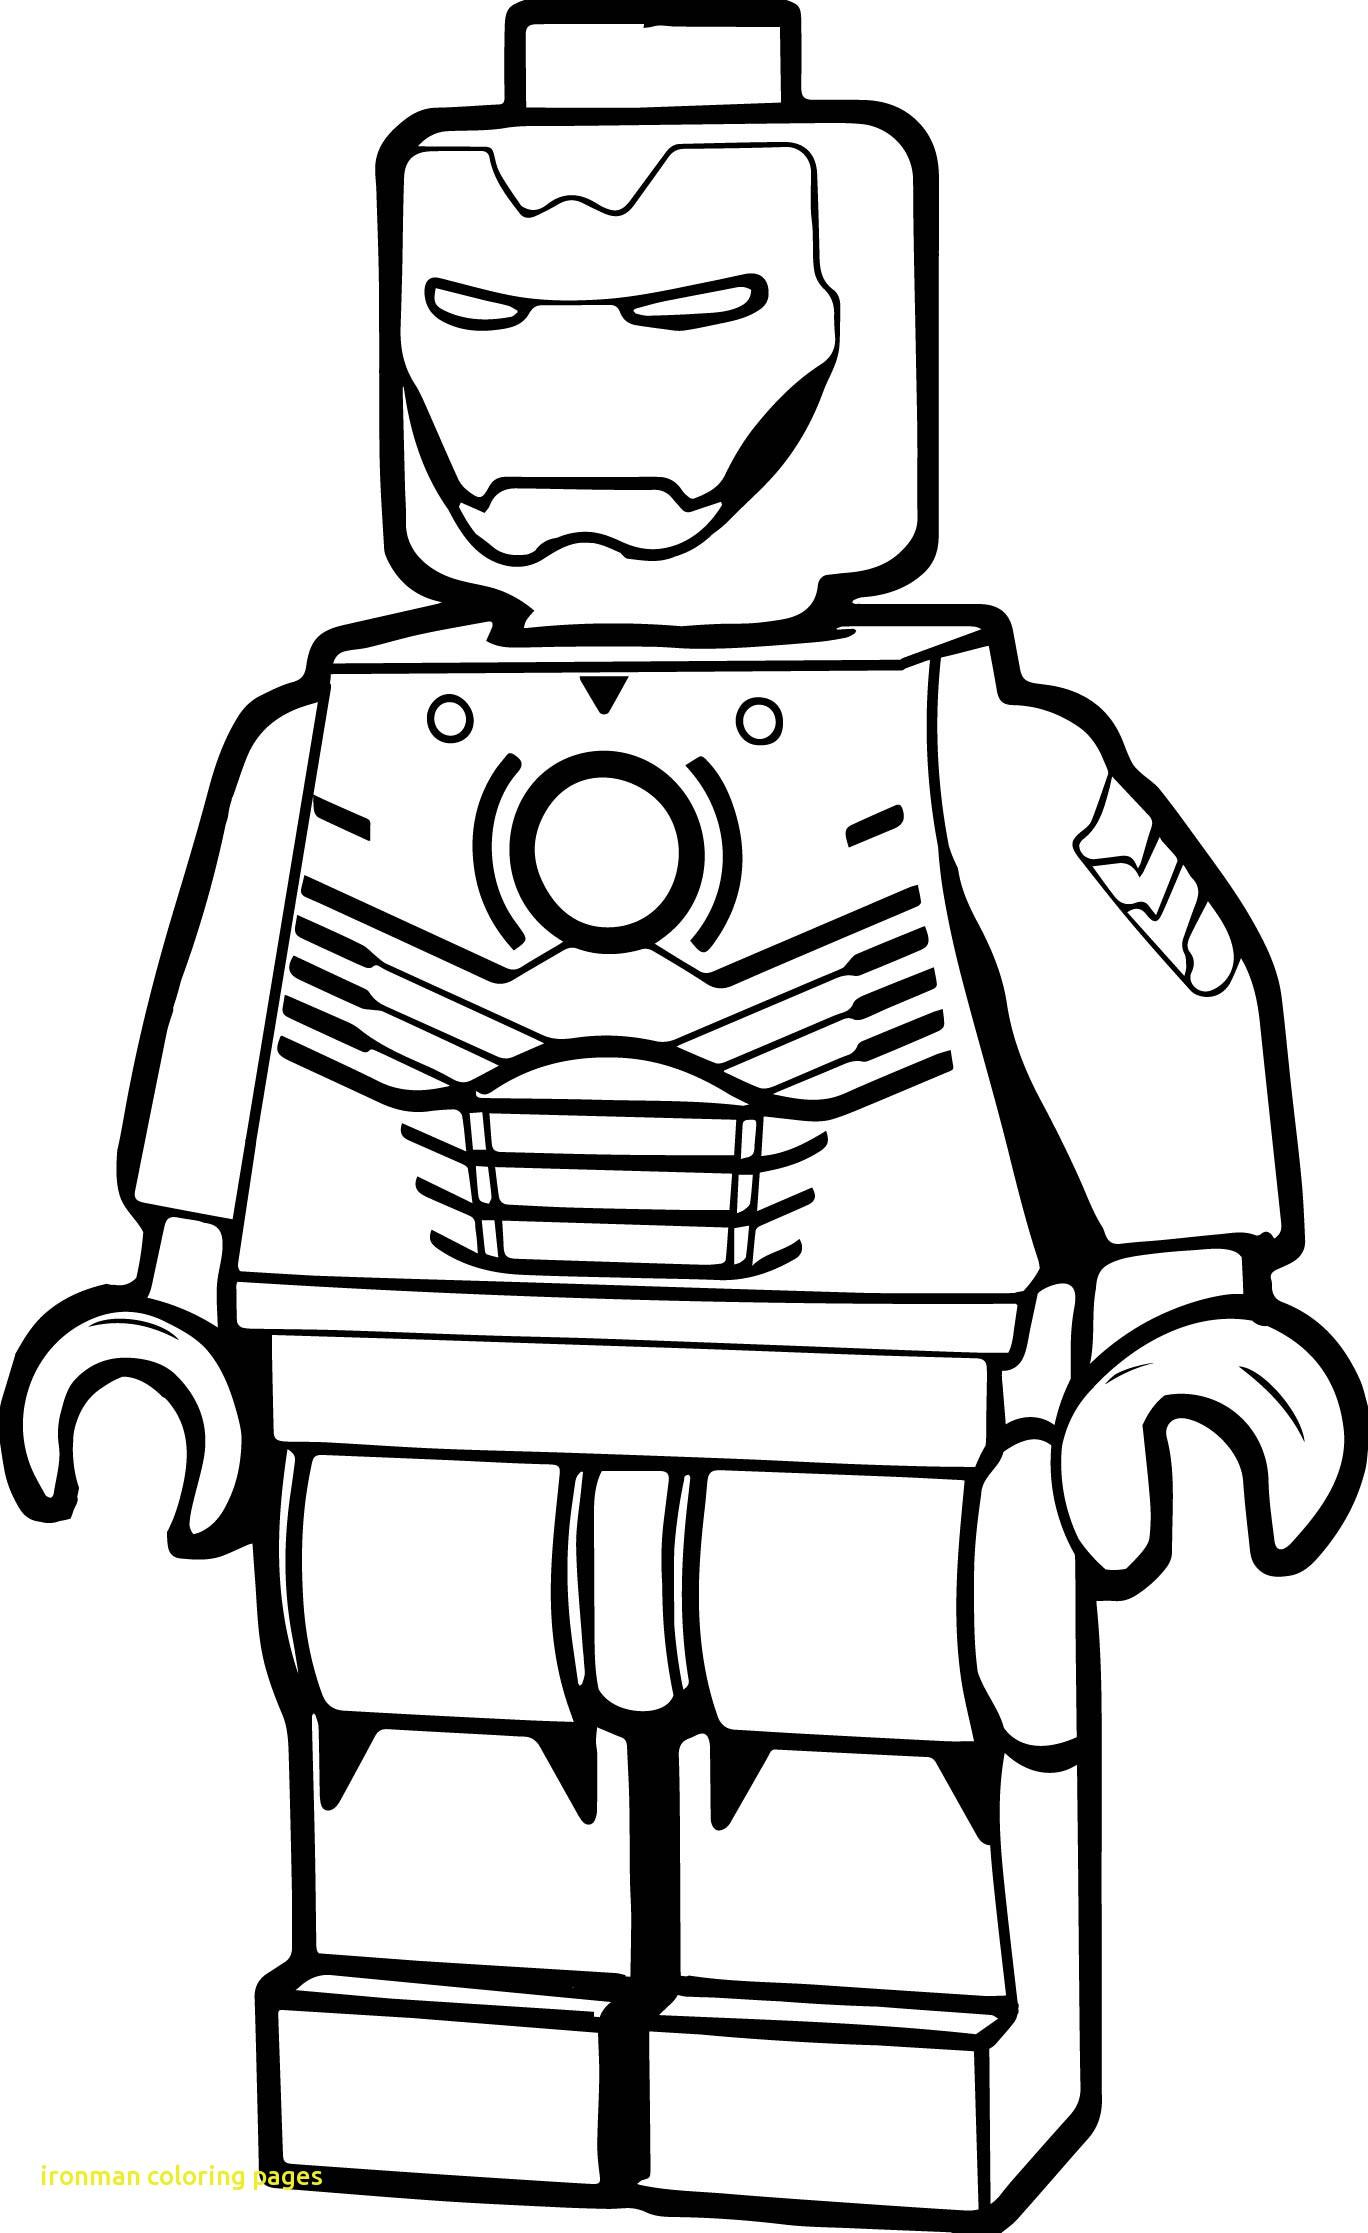 Gambar Mewarnai Lego Spiderman